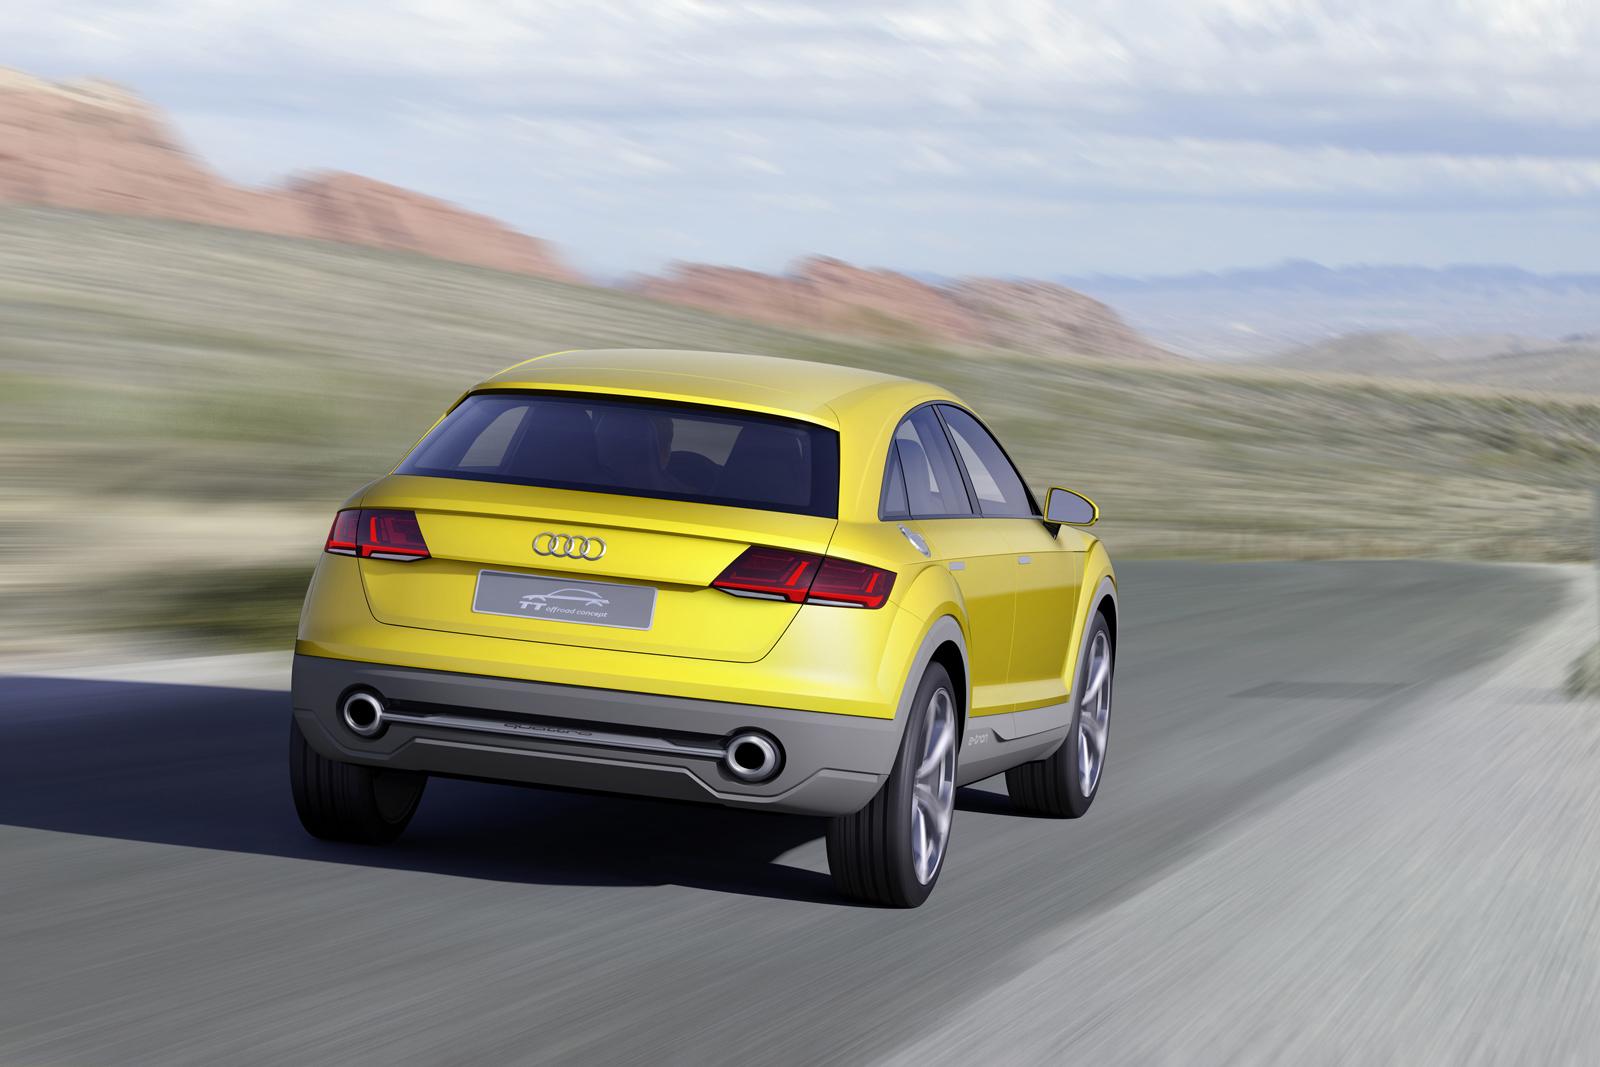 Концепт Audi TT Offroad